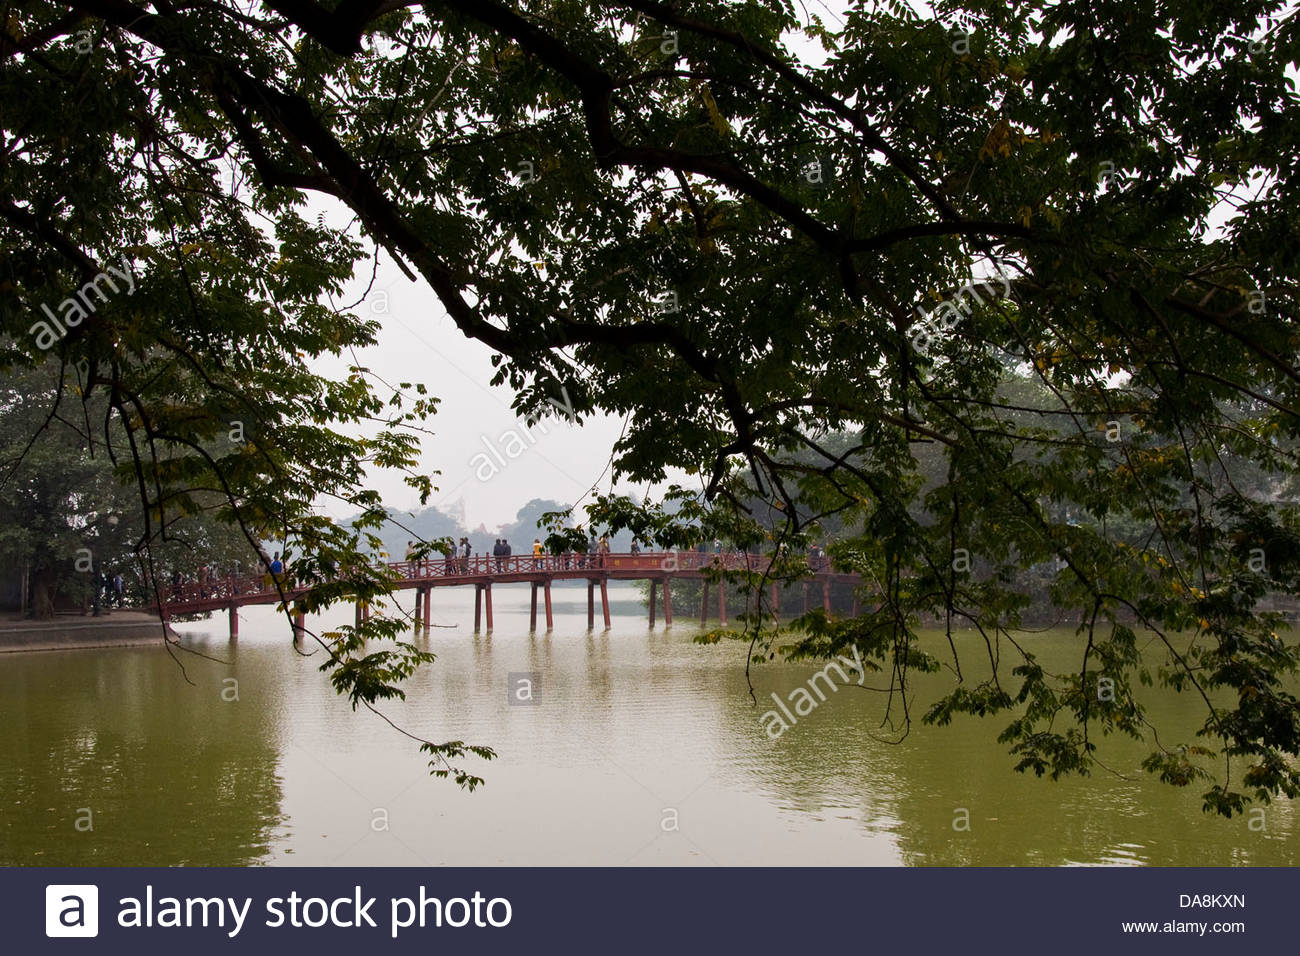 The Huc bridge,Hoan Kiem lake,Hanoi,Vietnam - Stock Image